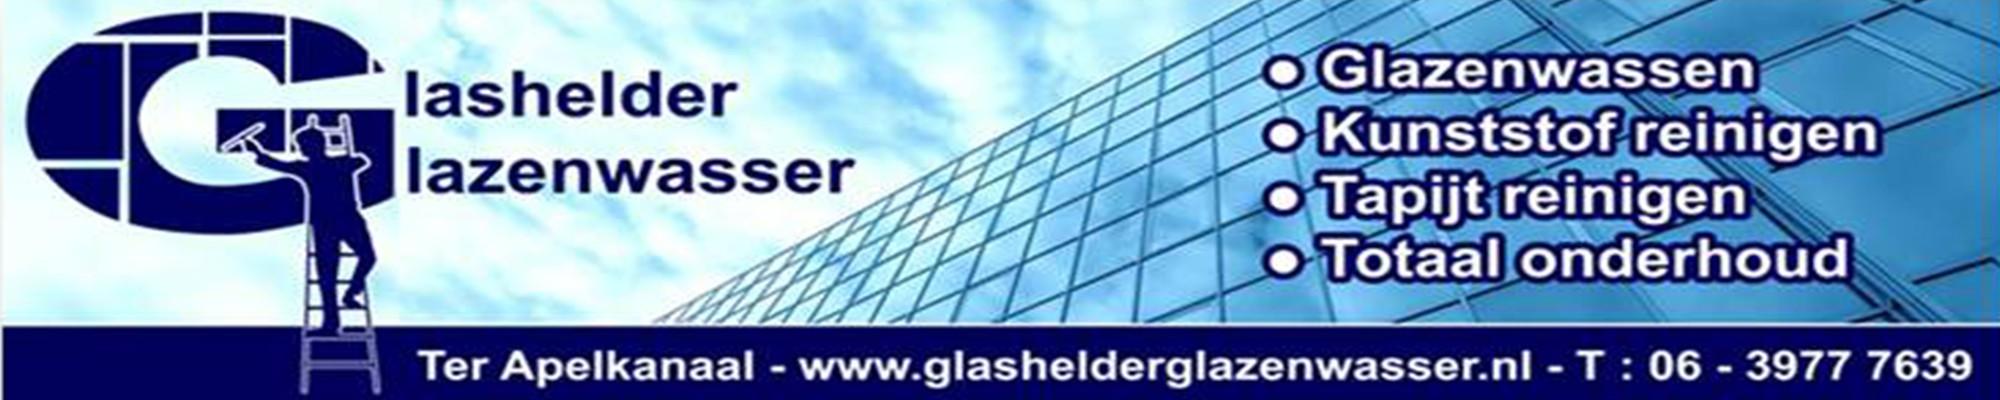 GlasHelder Glazenwassers